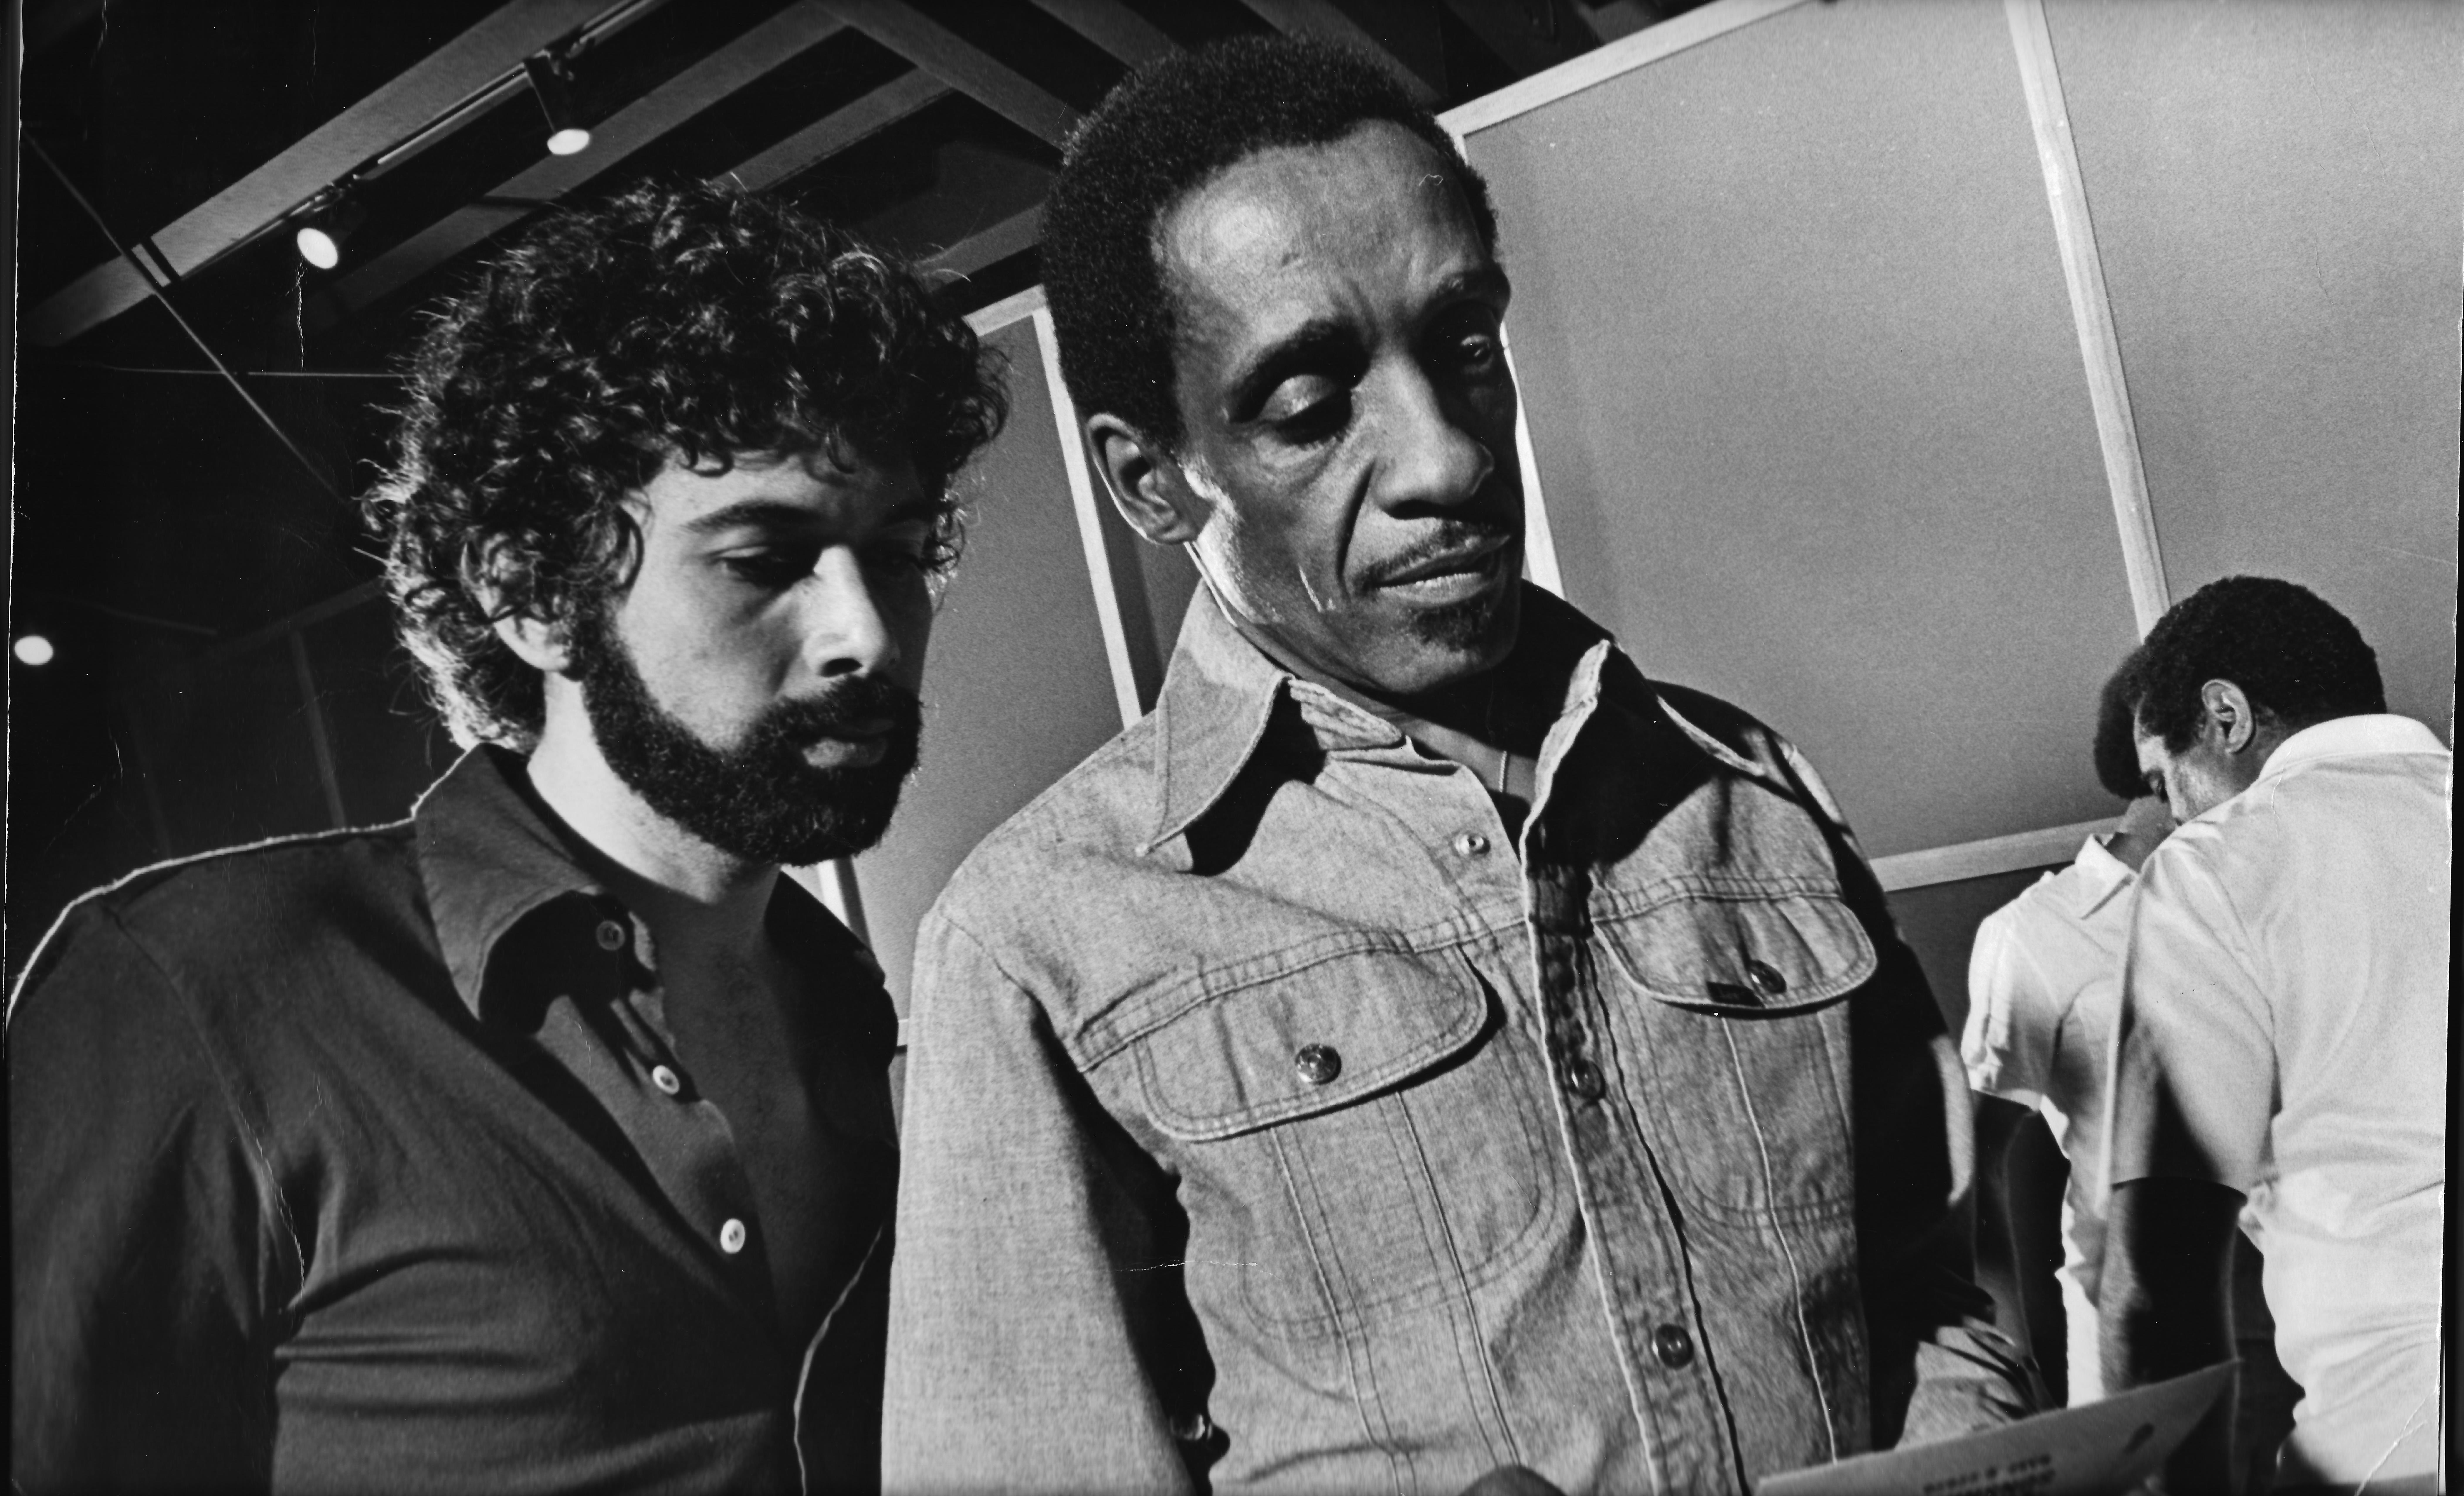 Monty and Milt Jackson